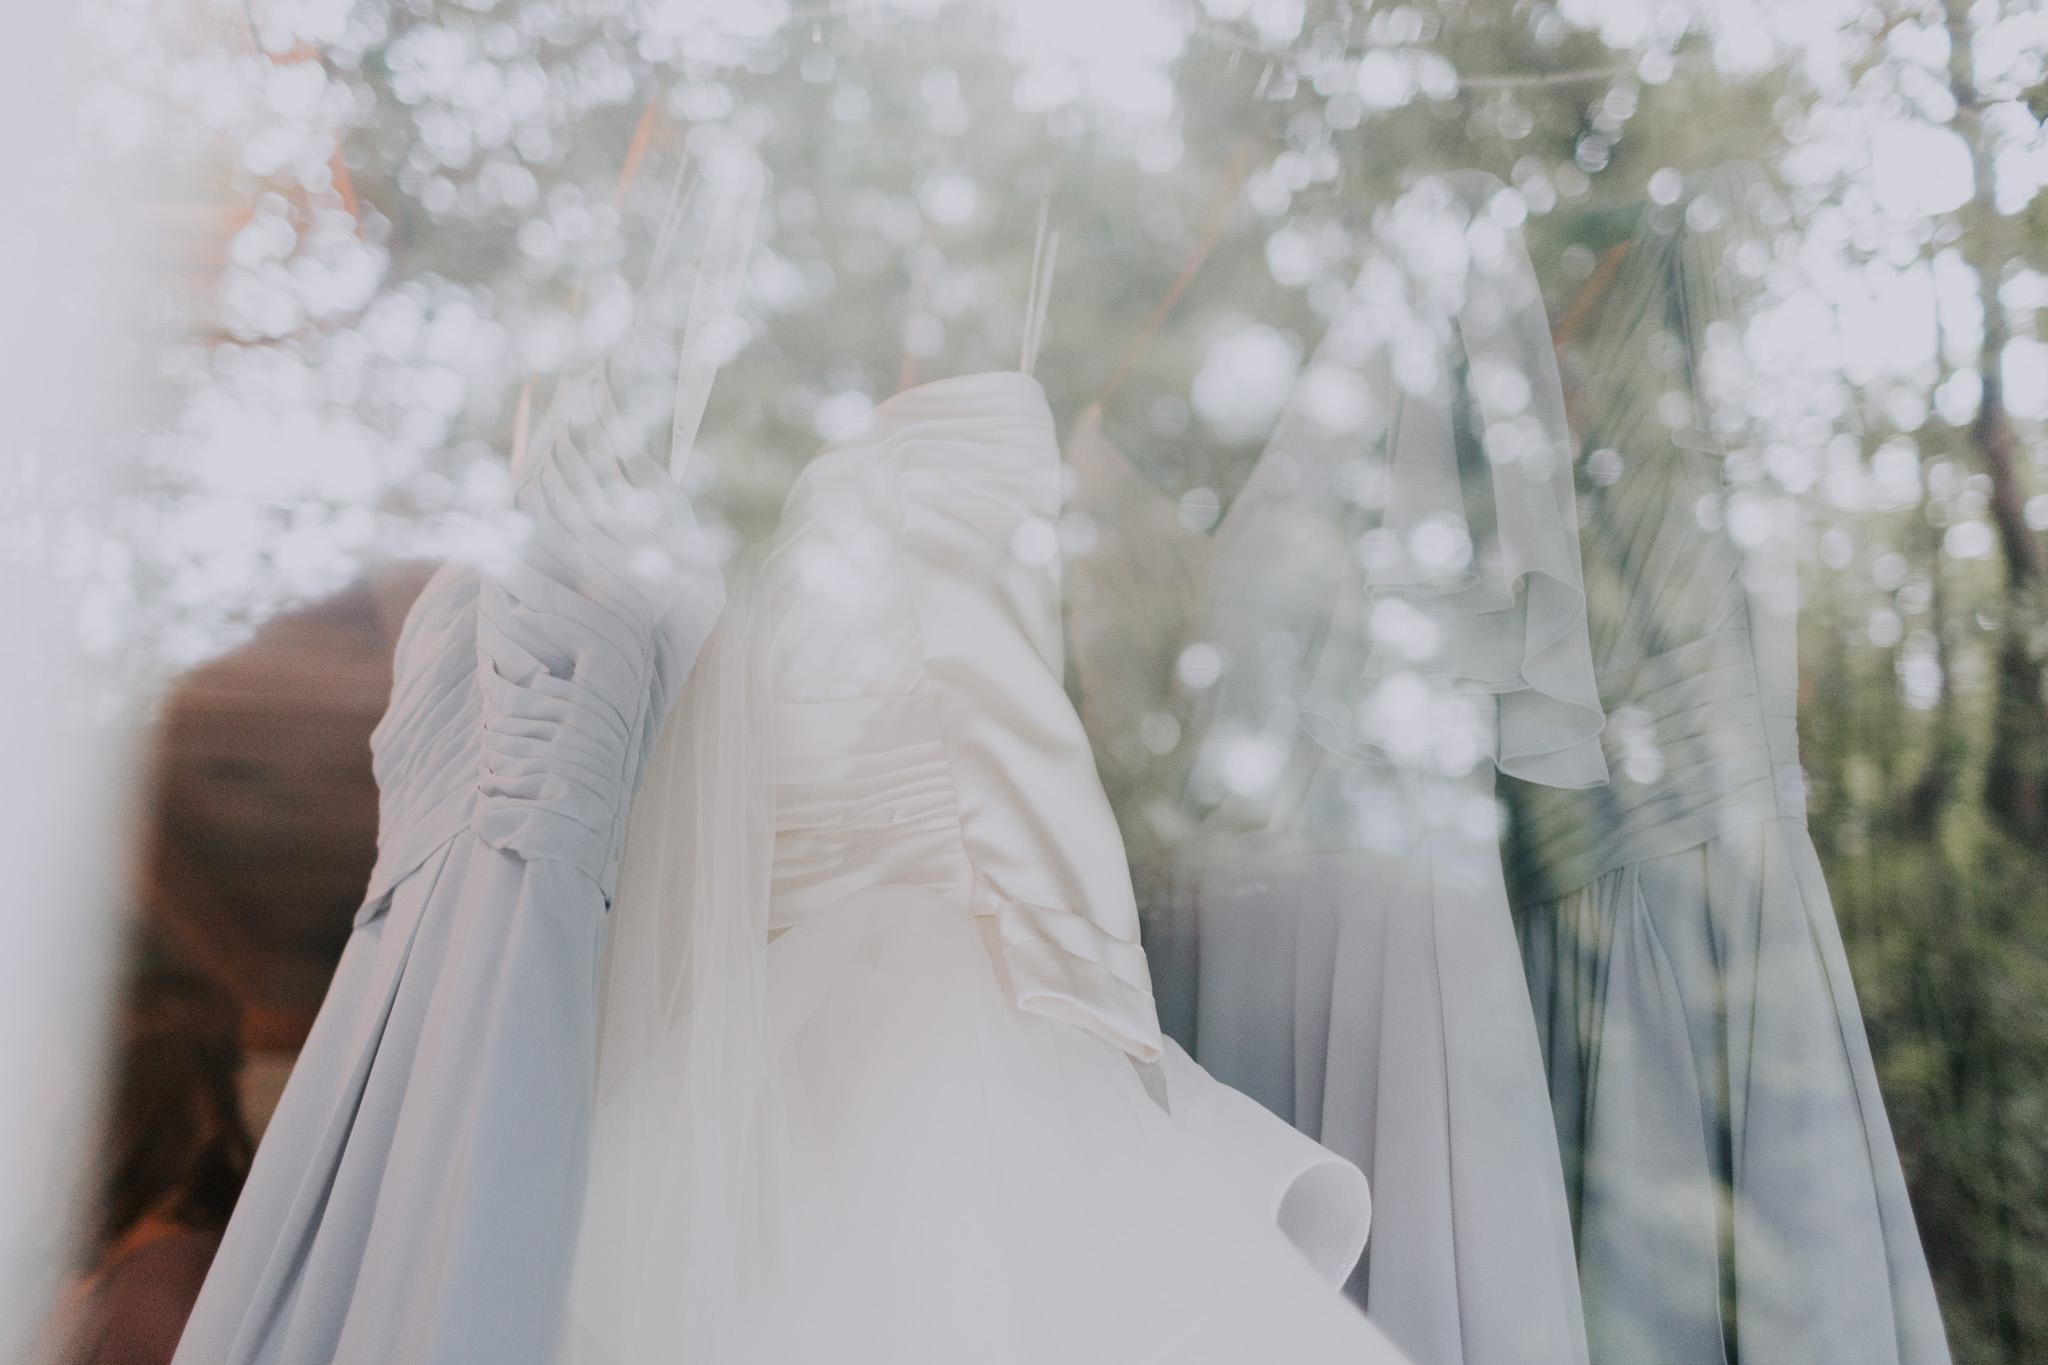 MillCreek-Wilde-Wedding-Barn-Michigan-Eliza-Eric-Vafa-Photo51.jpg